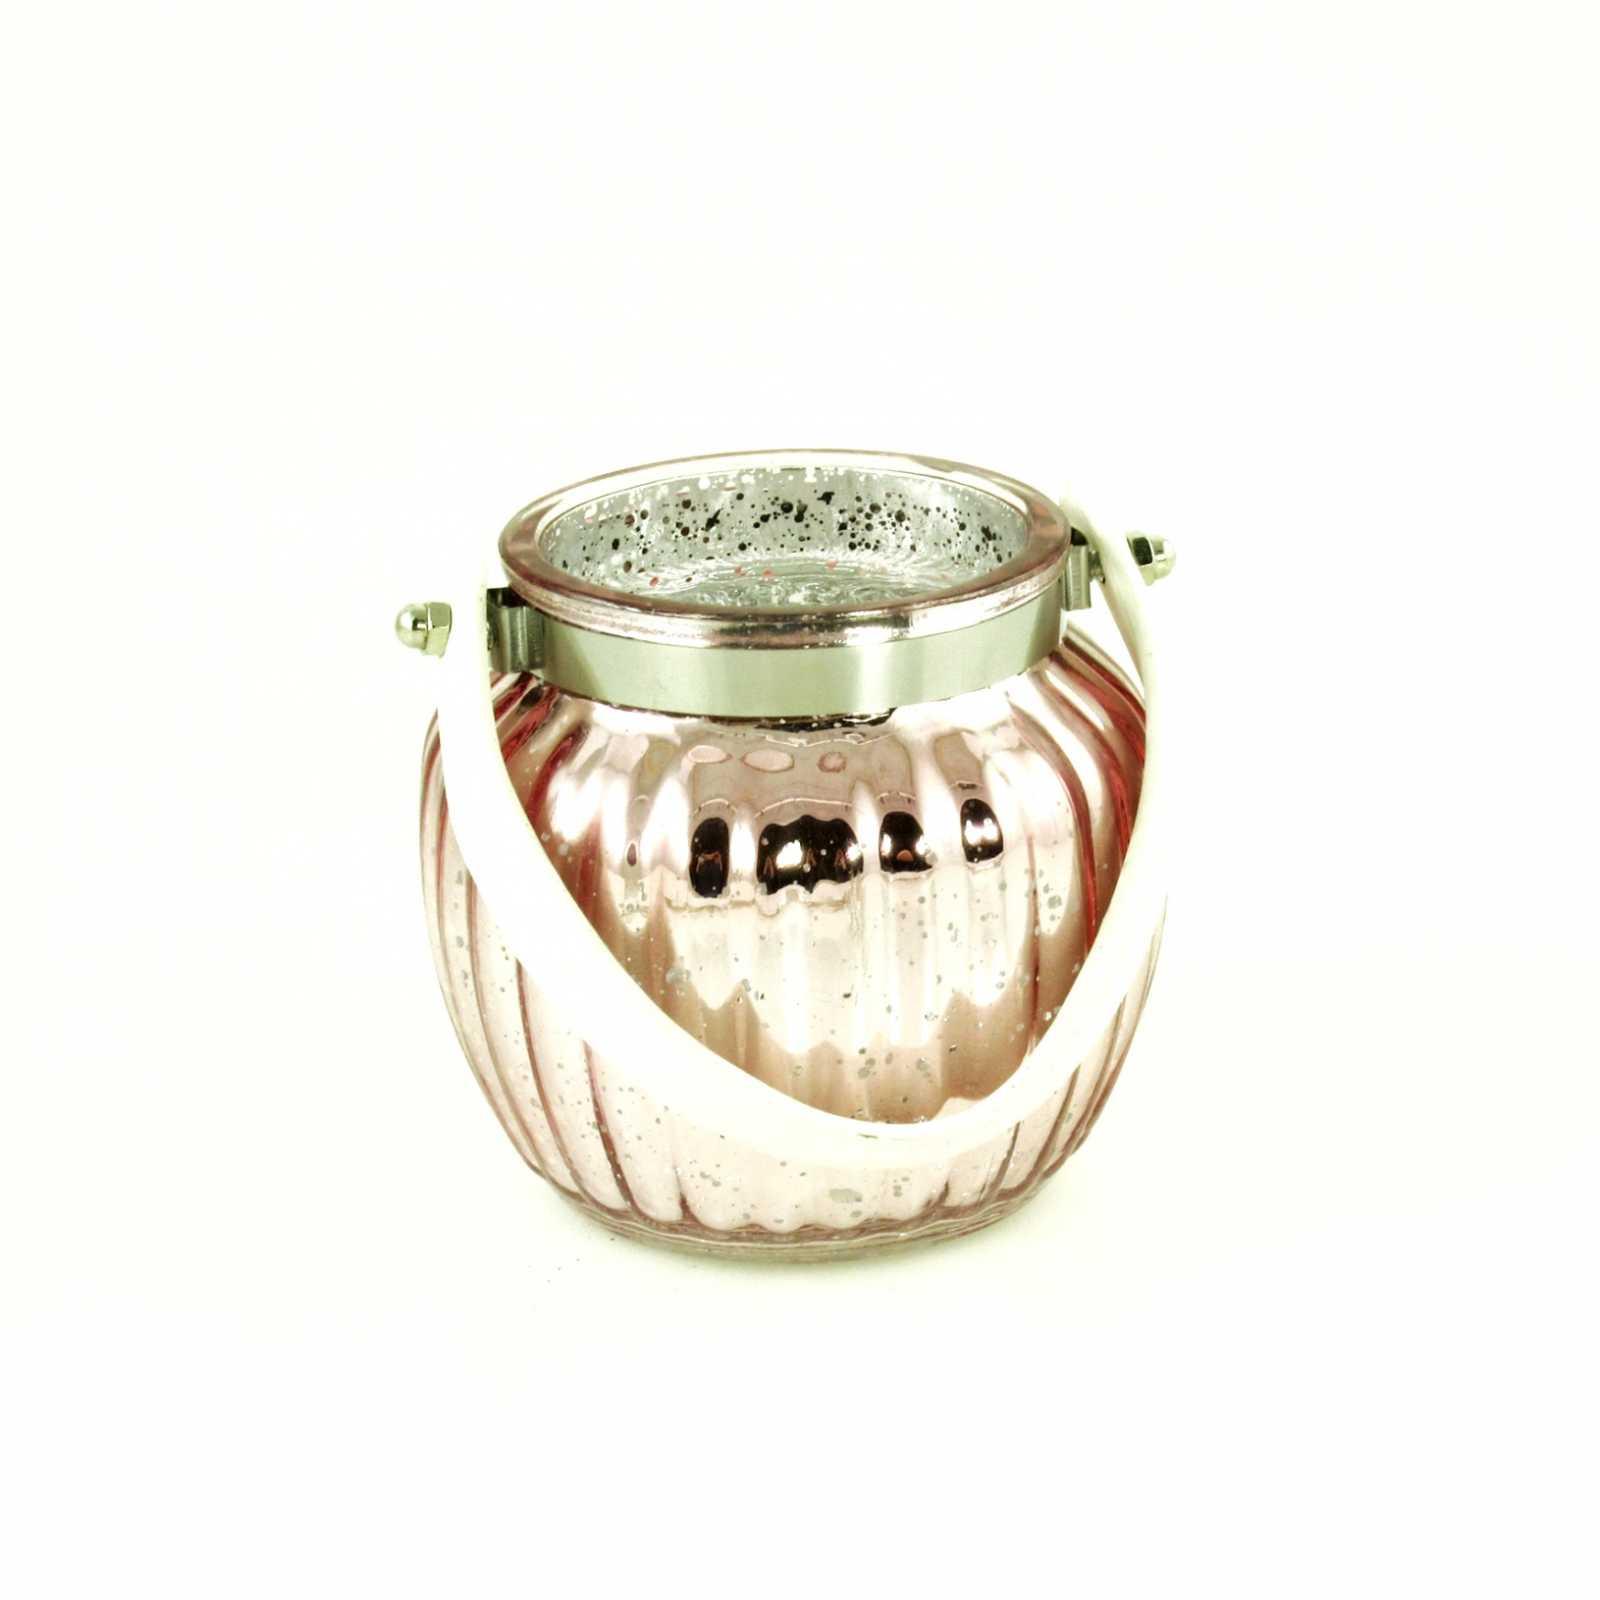 Онлайн каталог PROMENU: Подсвечник Goldbach, 11,5х11,5х10,5 см, розовый Goldbach 63 6554